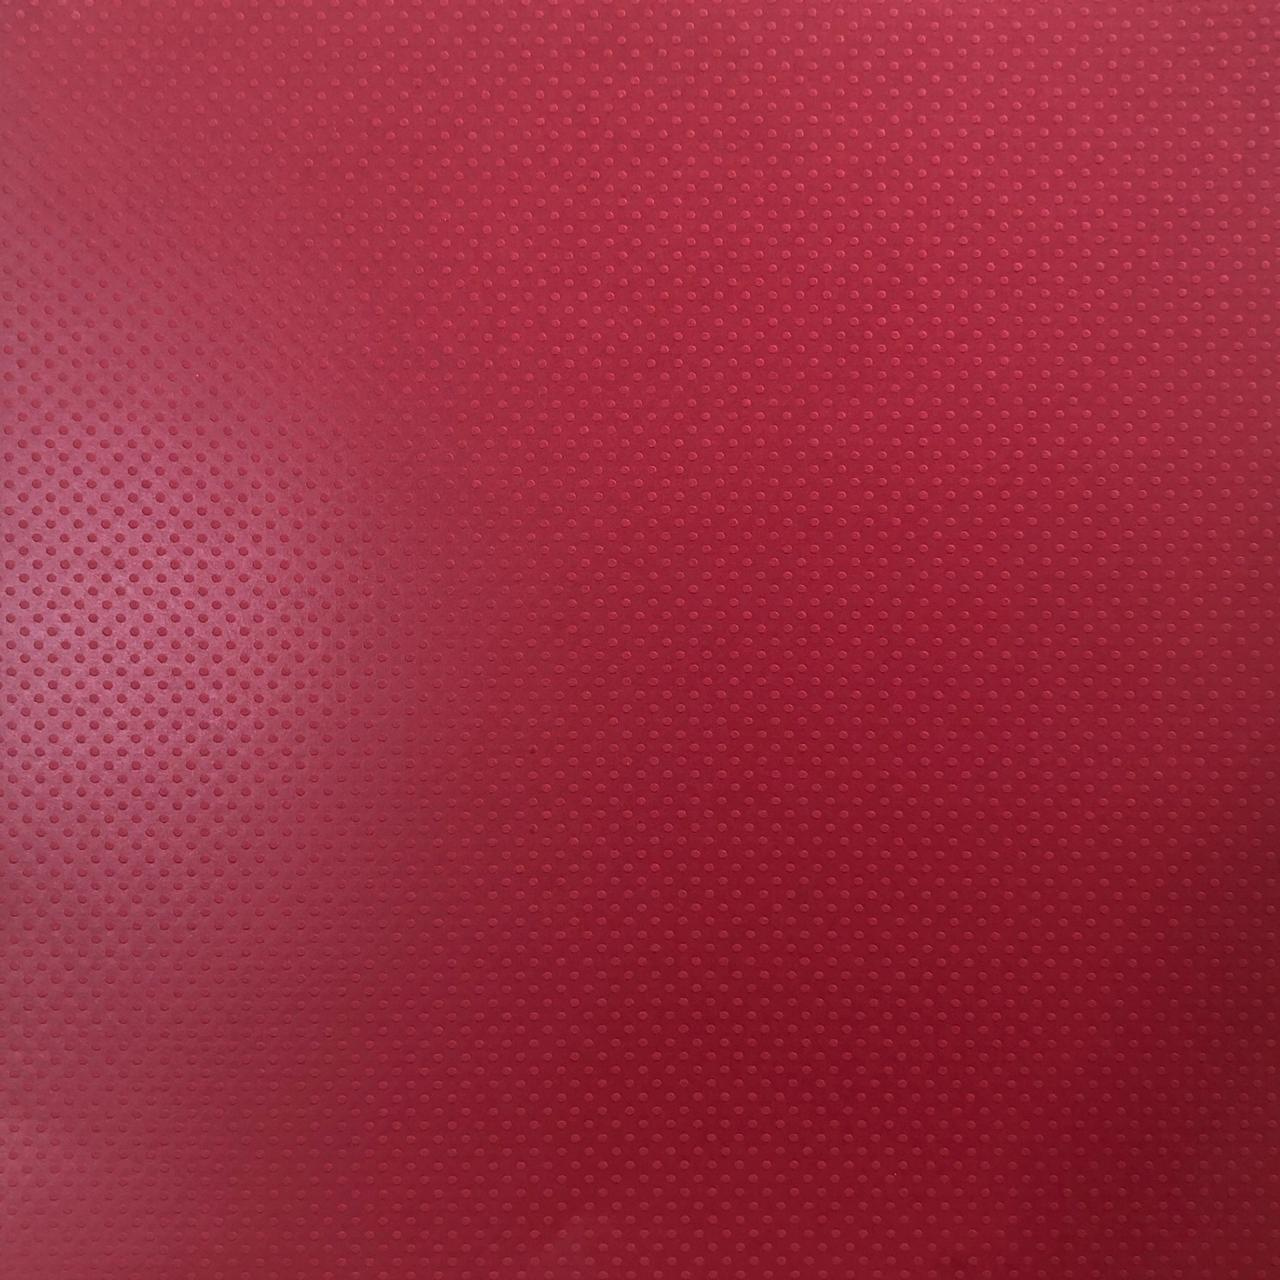 Papel Scrap Cardstock - Bolinhas II Vermelho (Phoenix) (303197)